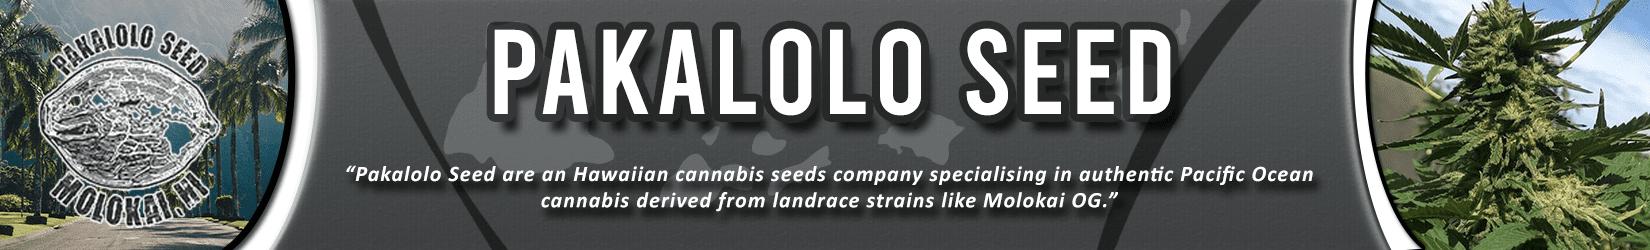 Cannabis Seeds Breeder - Pakalolo Seed